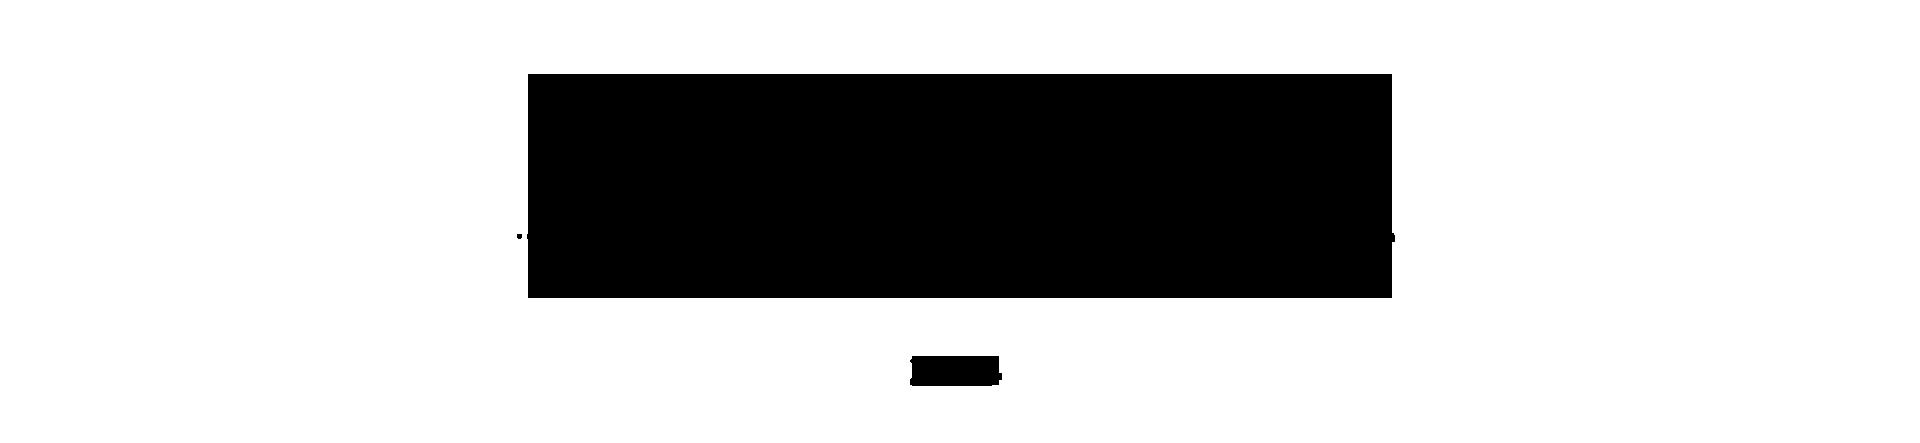 2014ii